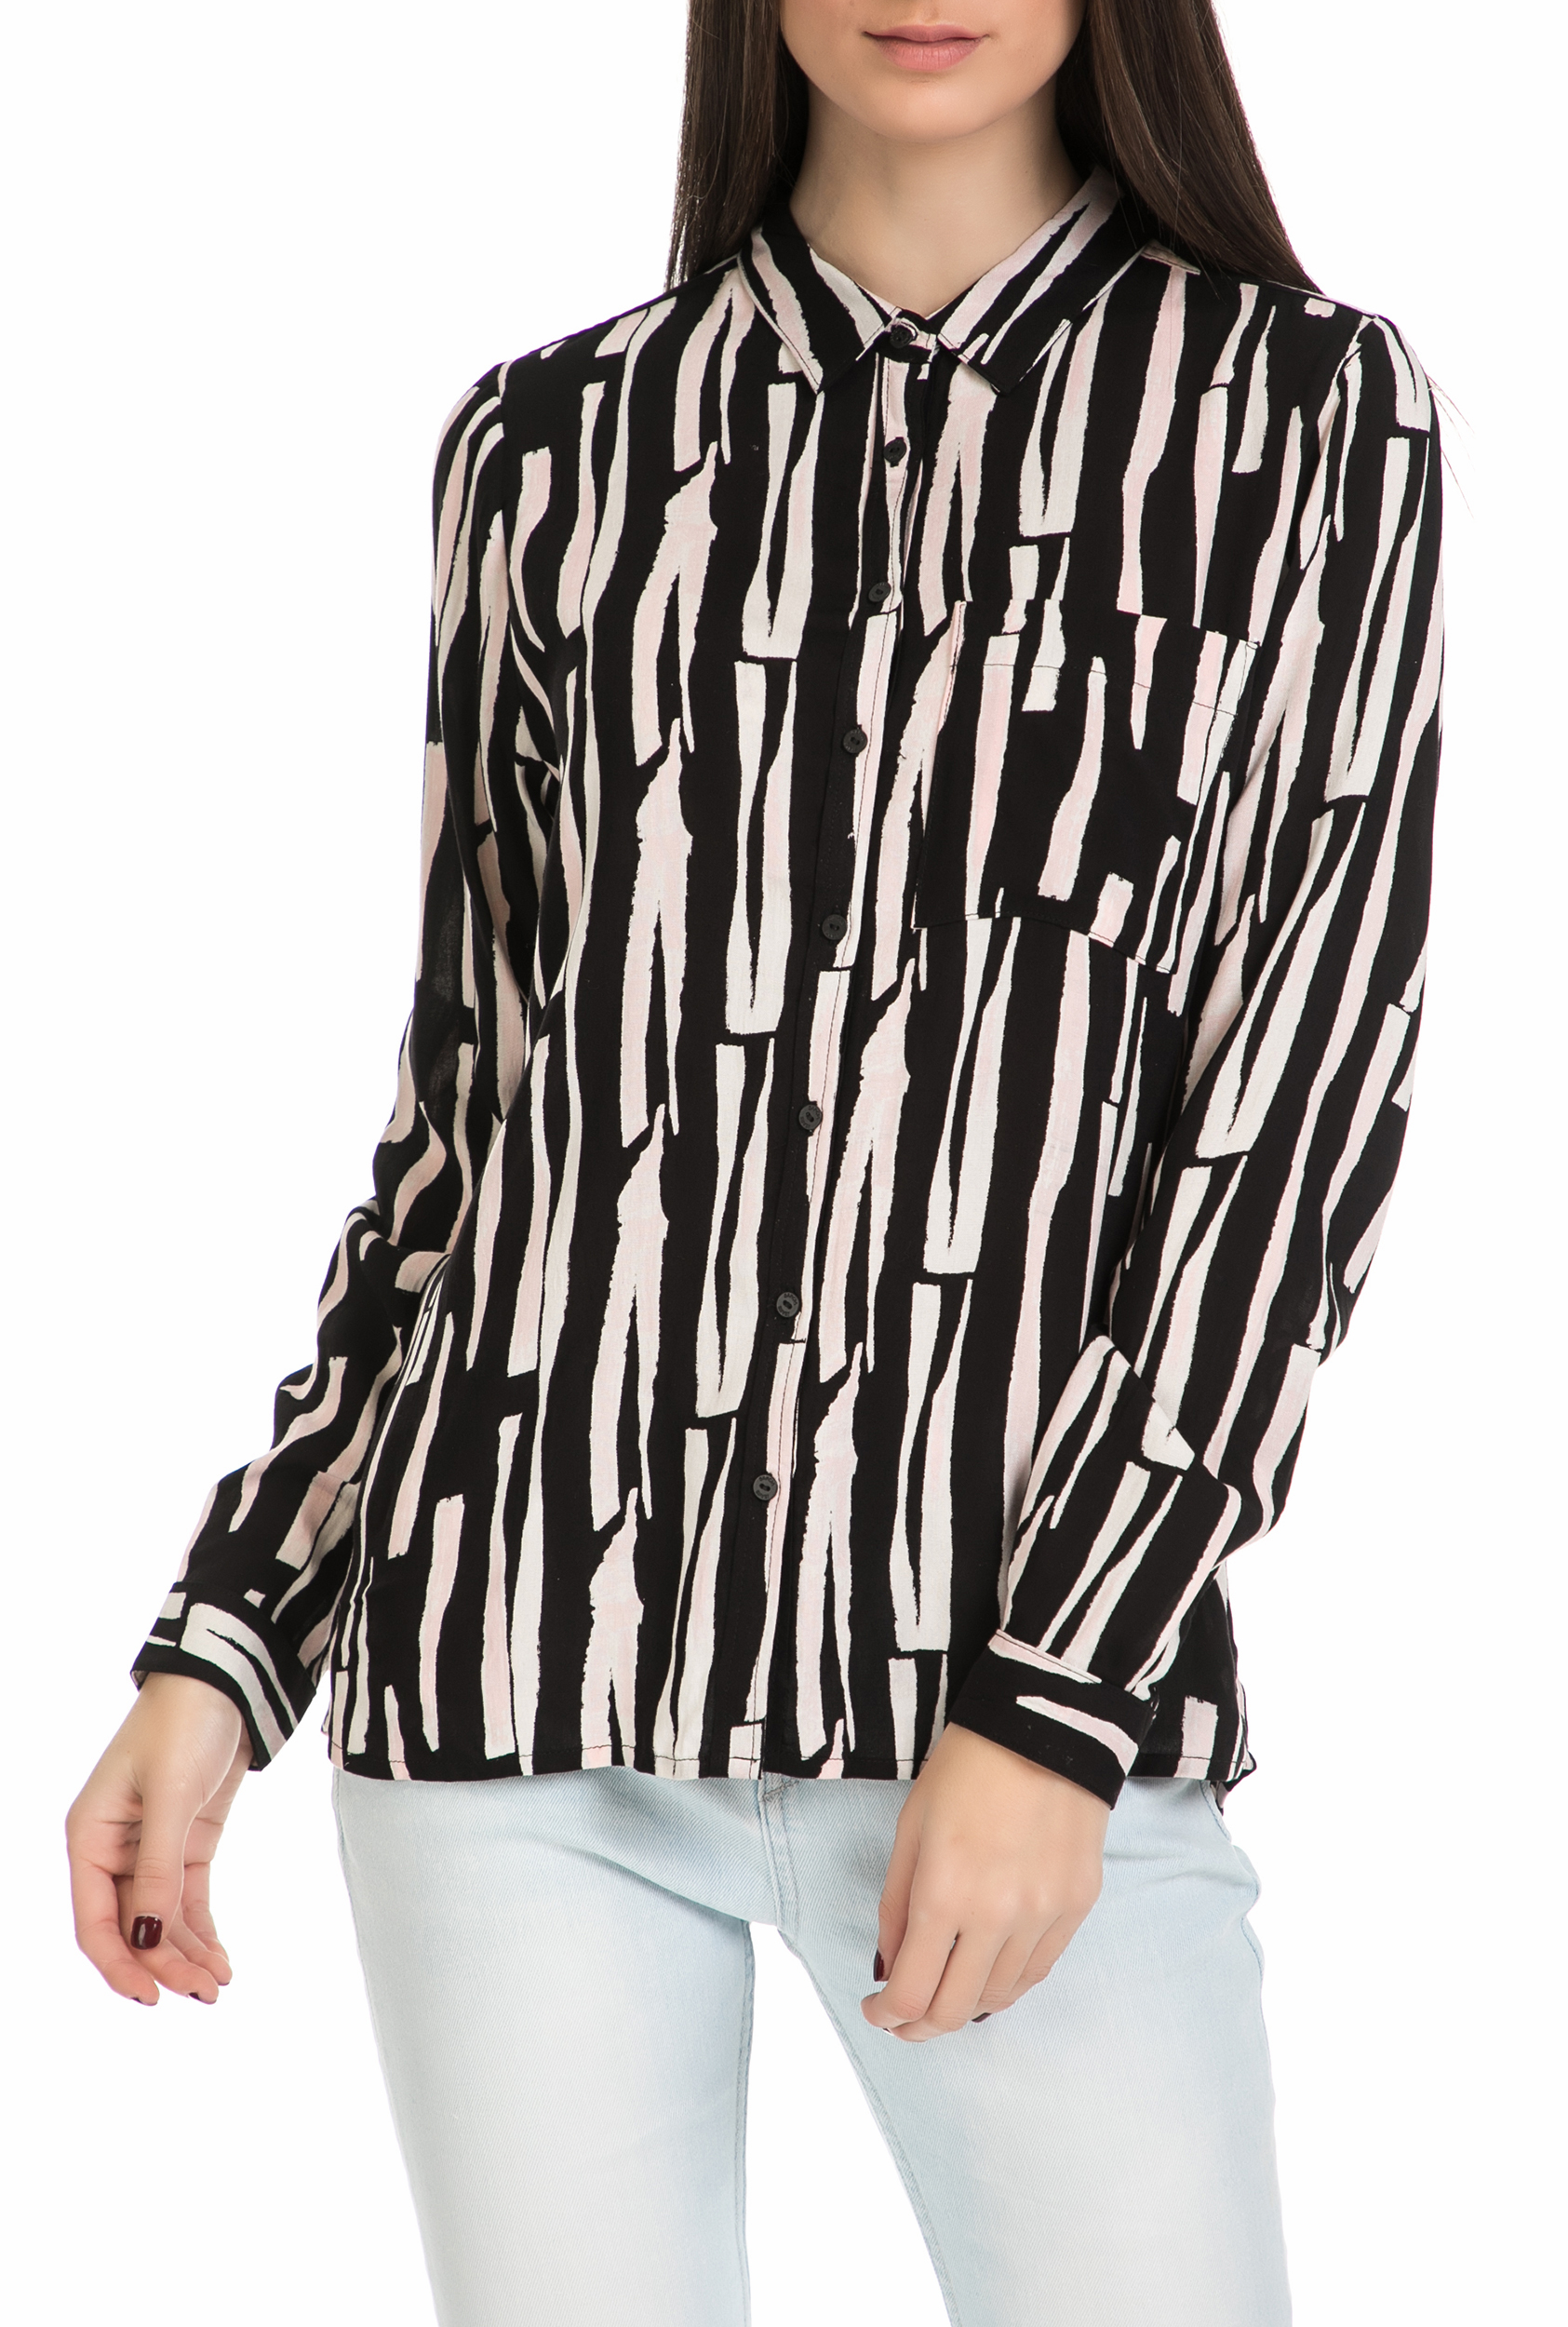 e61f00dbbbcd CollectiveOnline GARCIA JEANS - Γυναικείο μακρυμάνικο πουκάμισο Garcia Jeans  ασπρόμαυρο